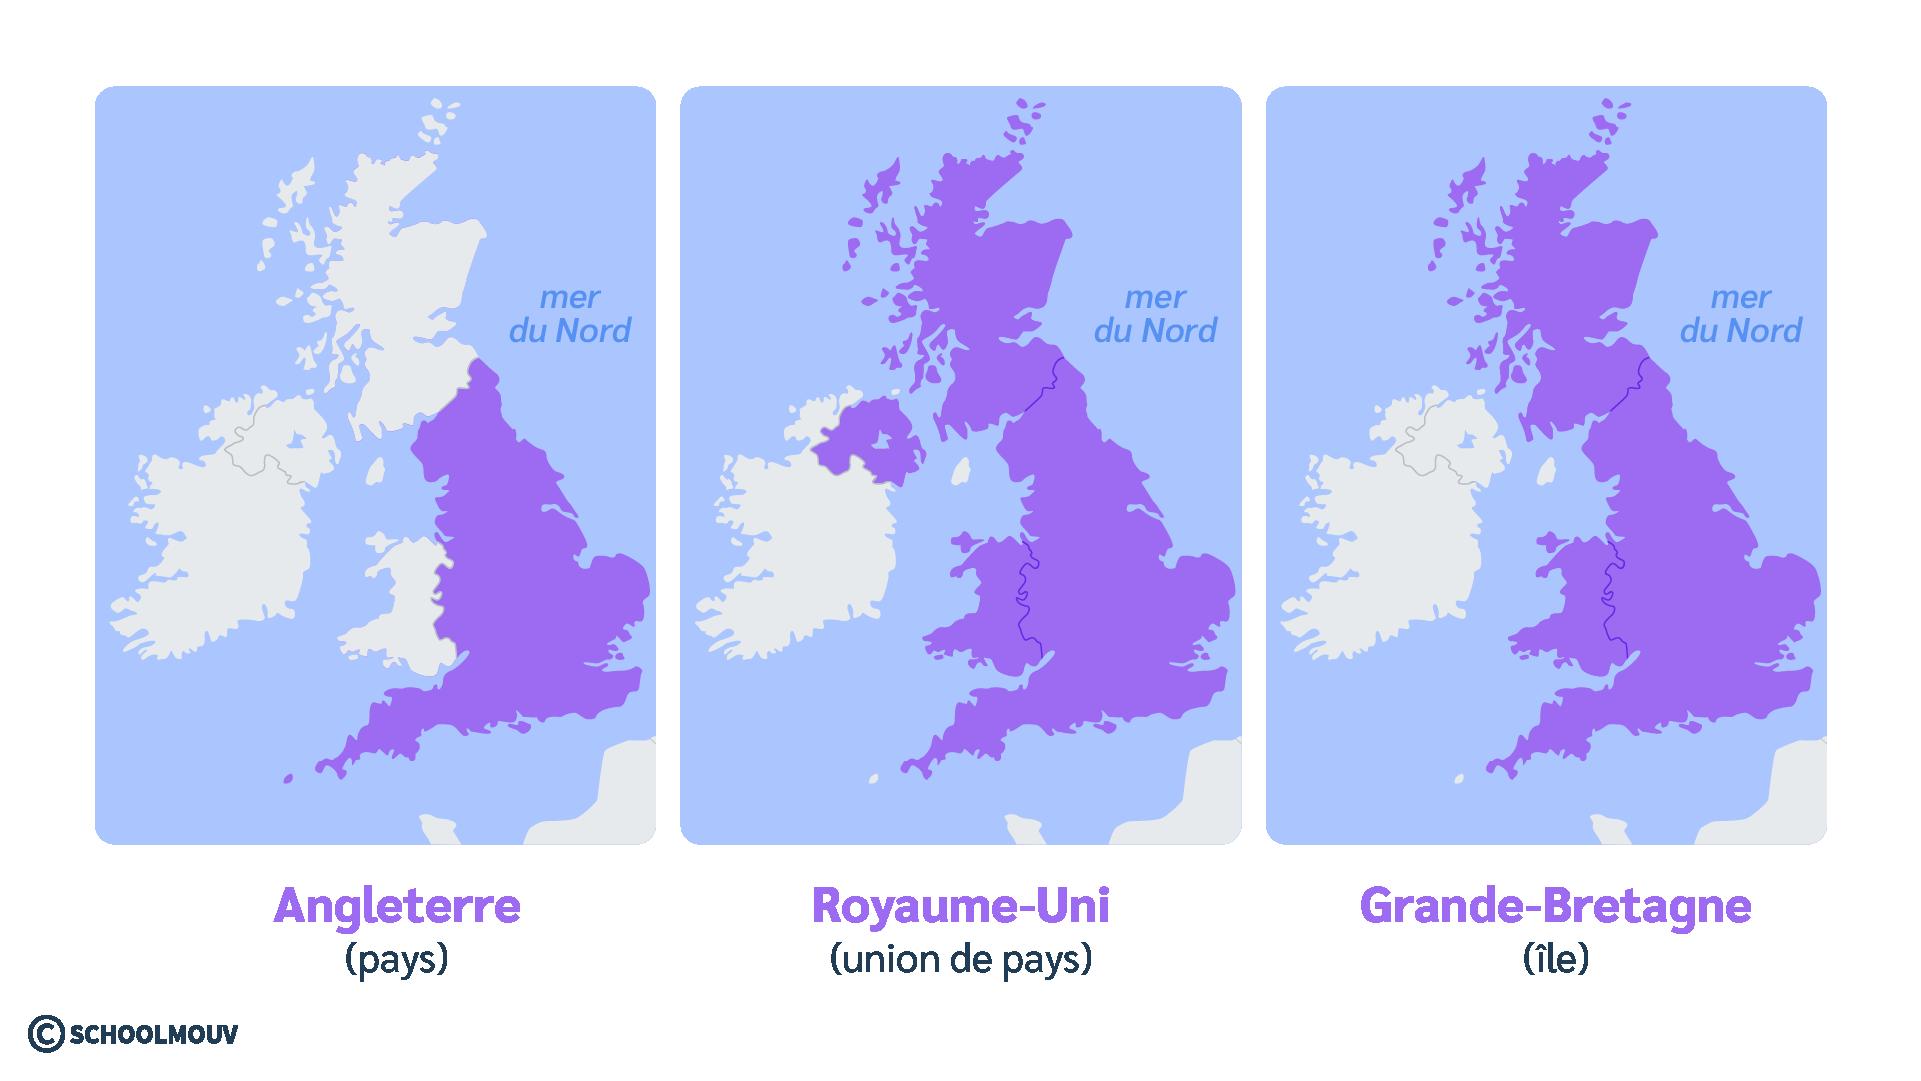 Angleterre Royaume-Uni Grande-Bretagne différence anglais